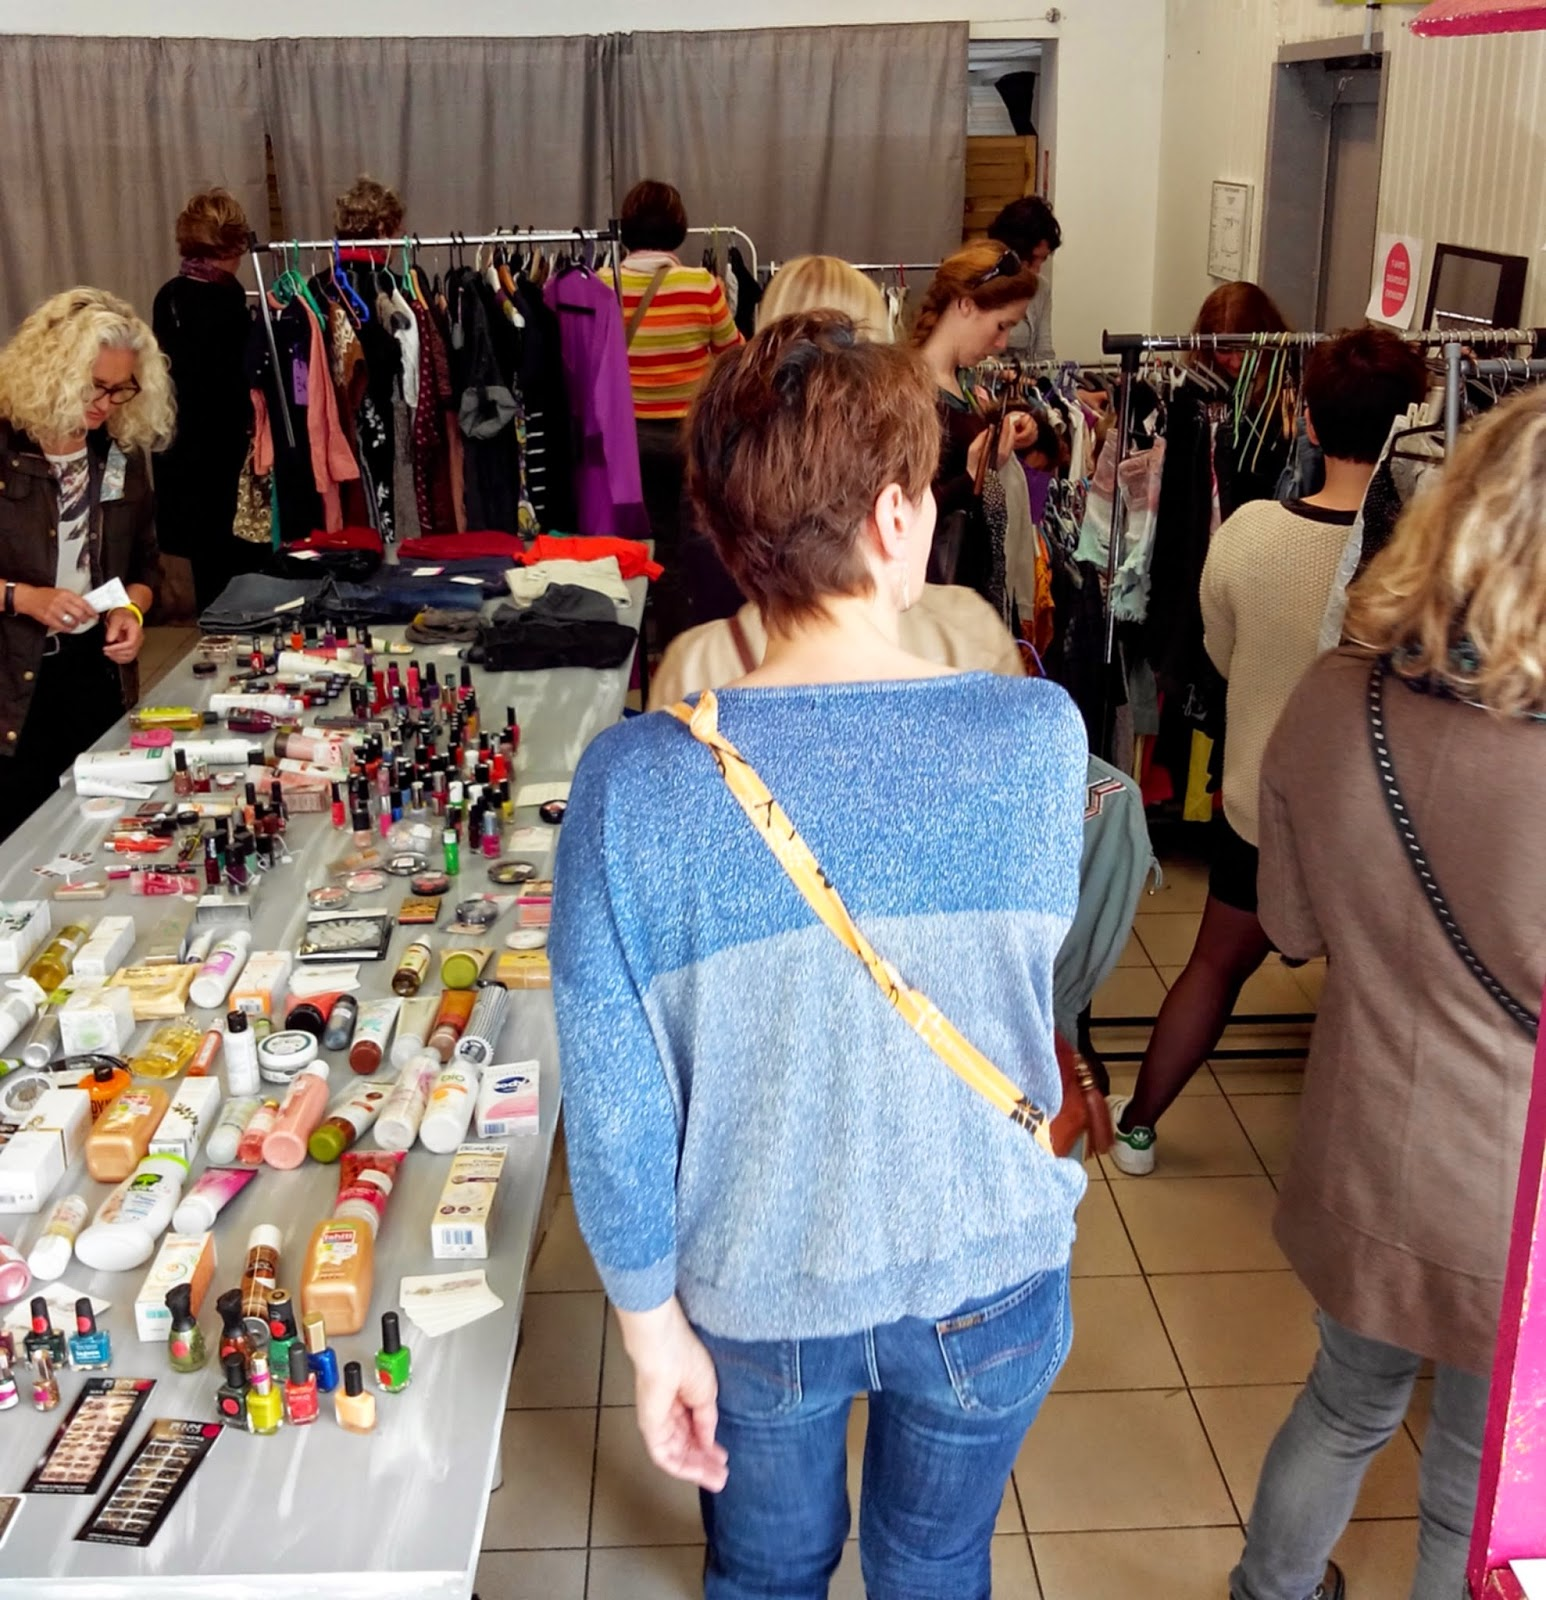 vide-dressing, vide-vanity, La Perle des Loisirs, Rezé, bullelodie